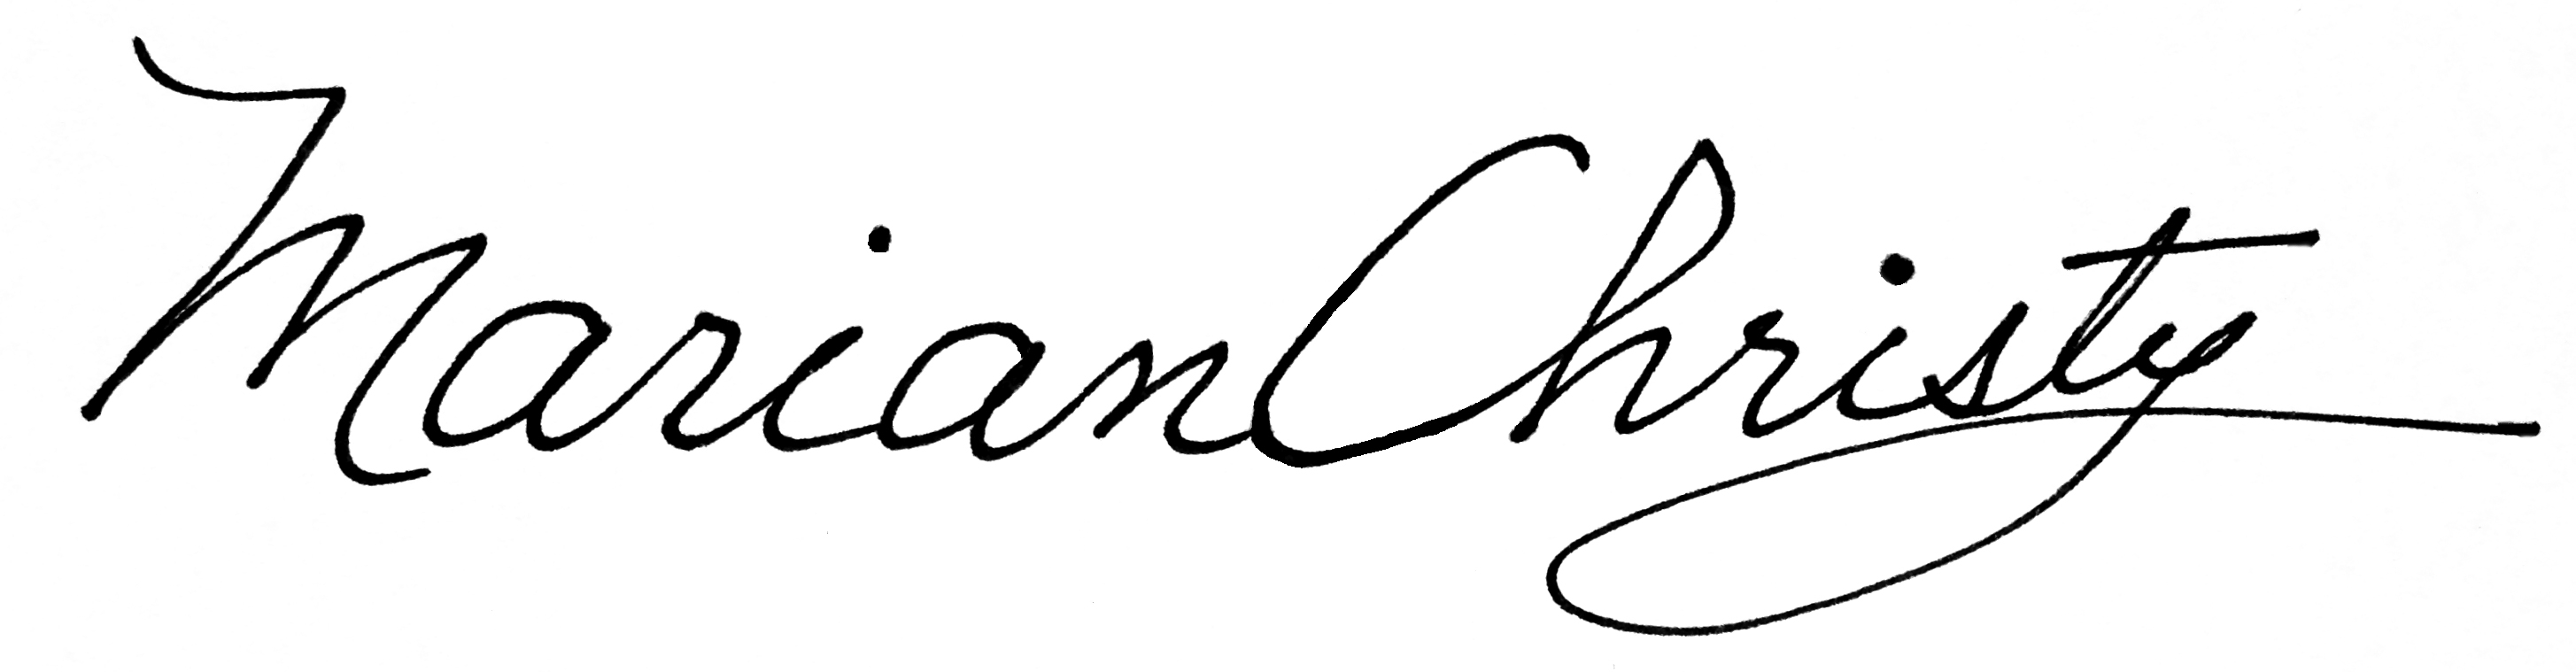 Marian Christy Signature